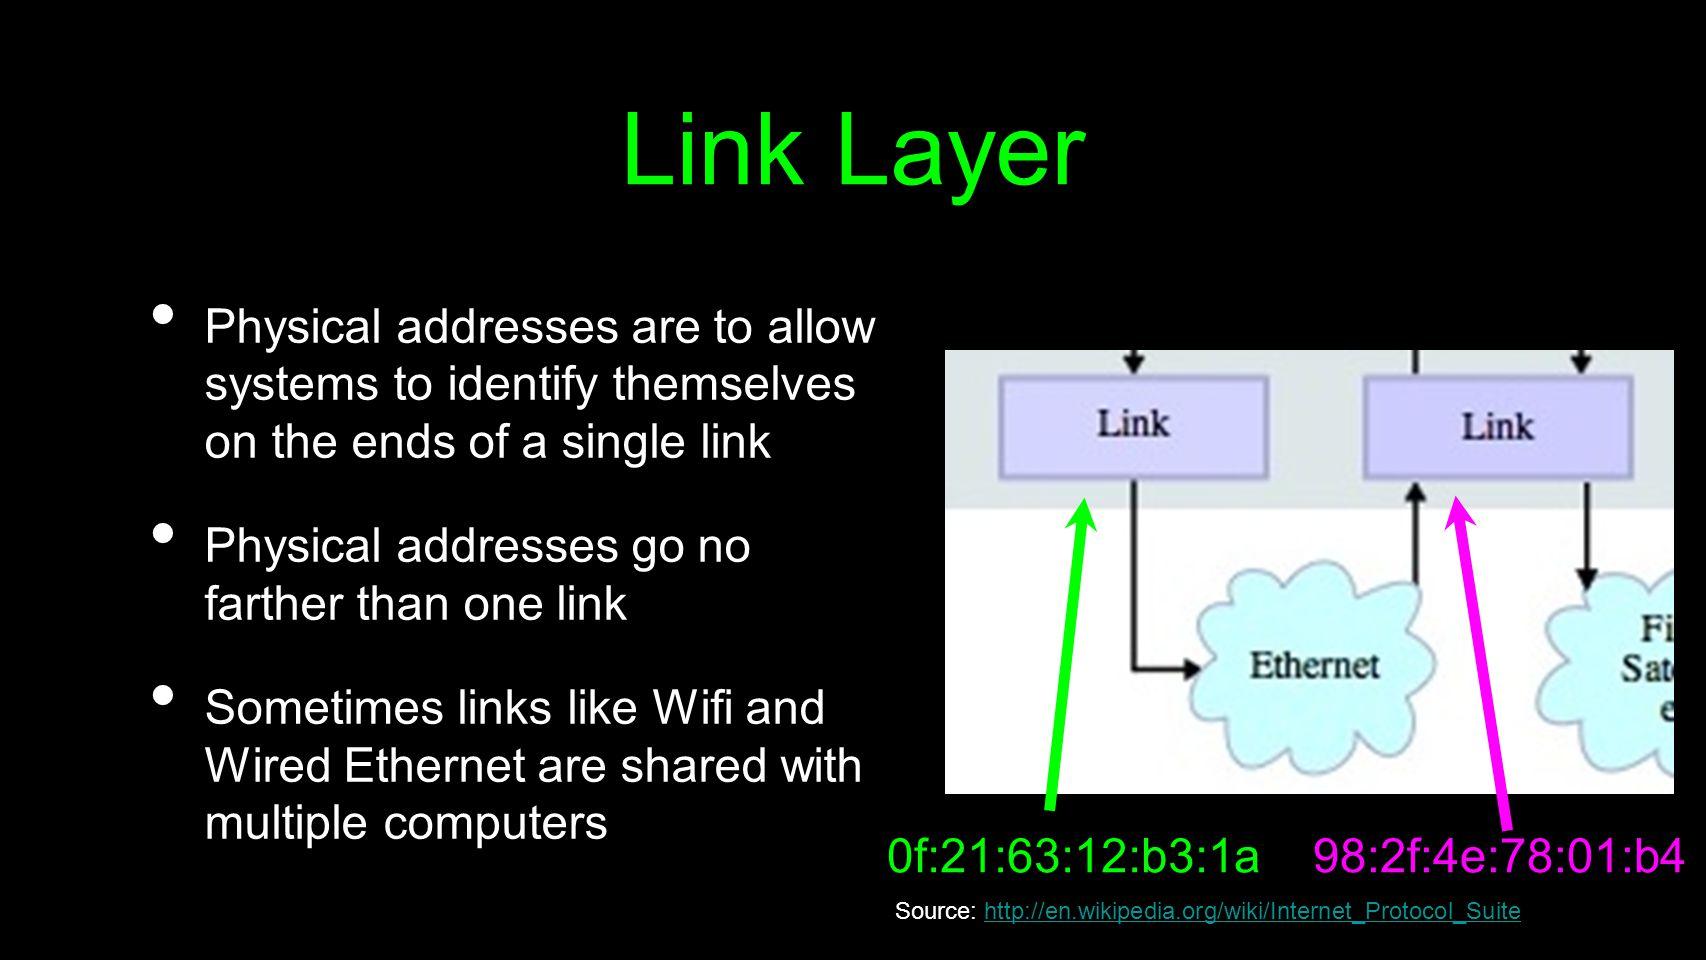 Source: http://en.wikipedia.org/wiki/Internet_Protocol_Suite